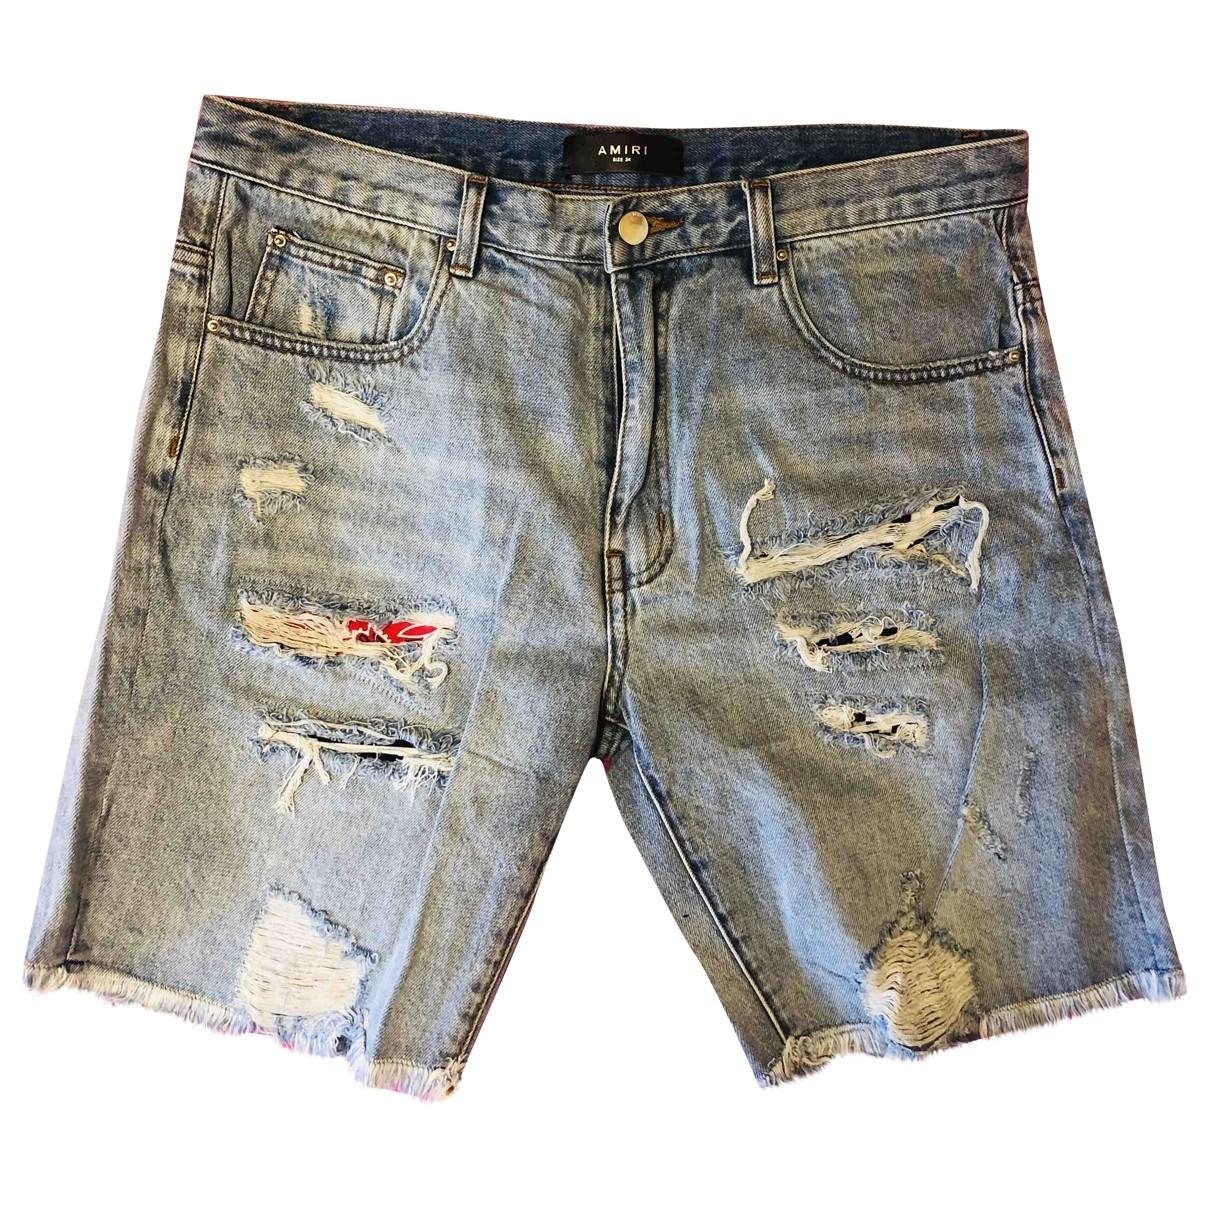 Amiri \N Blue Denim - Jeans Shorts for Men 34 UK - US